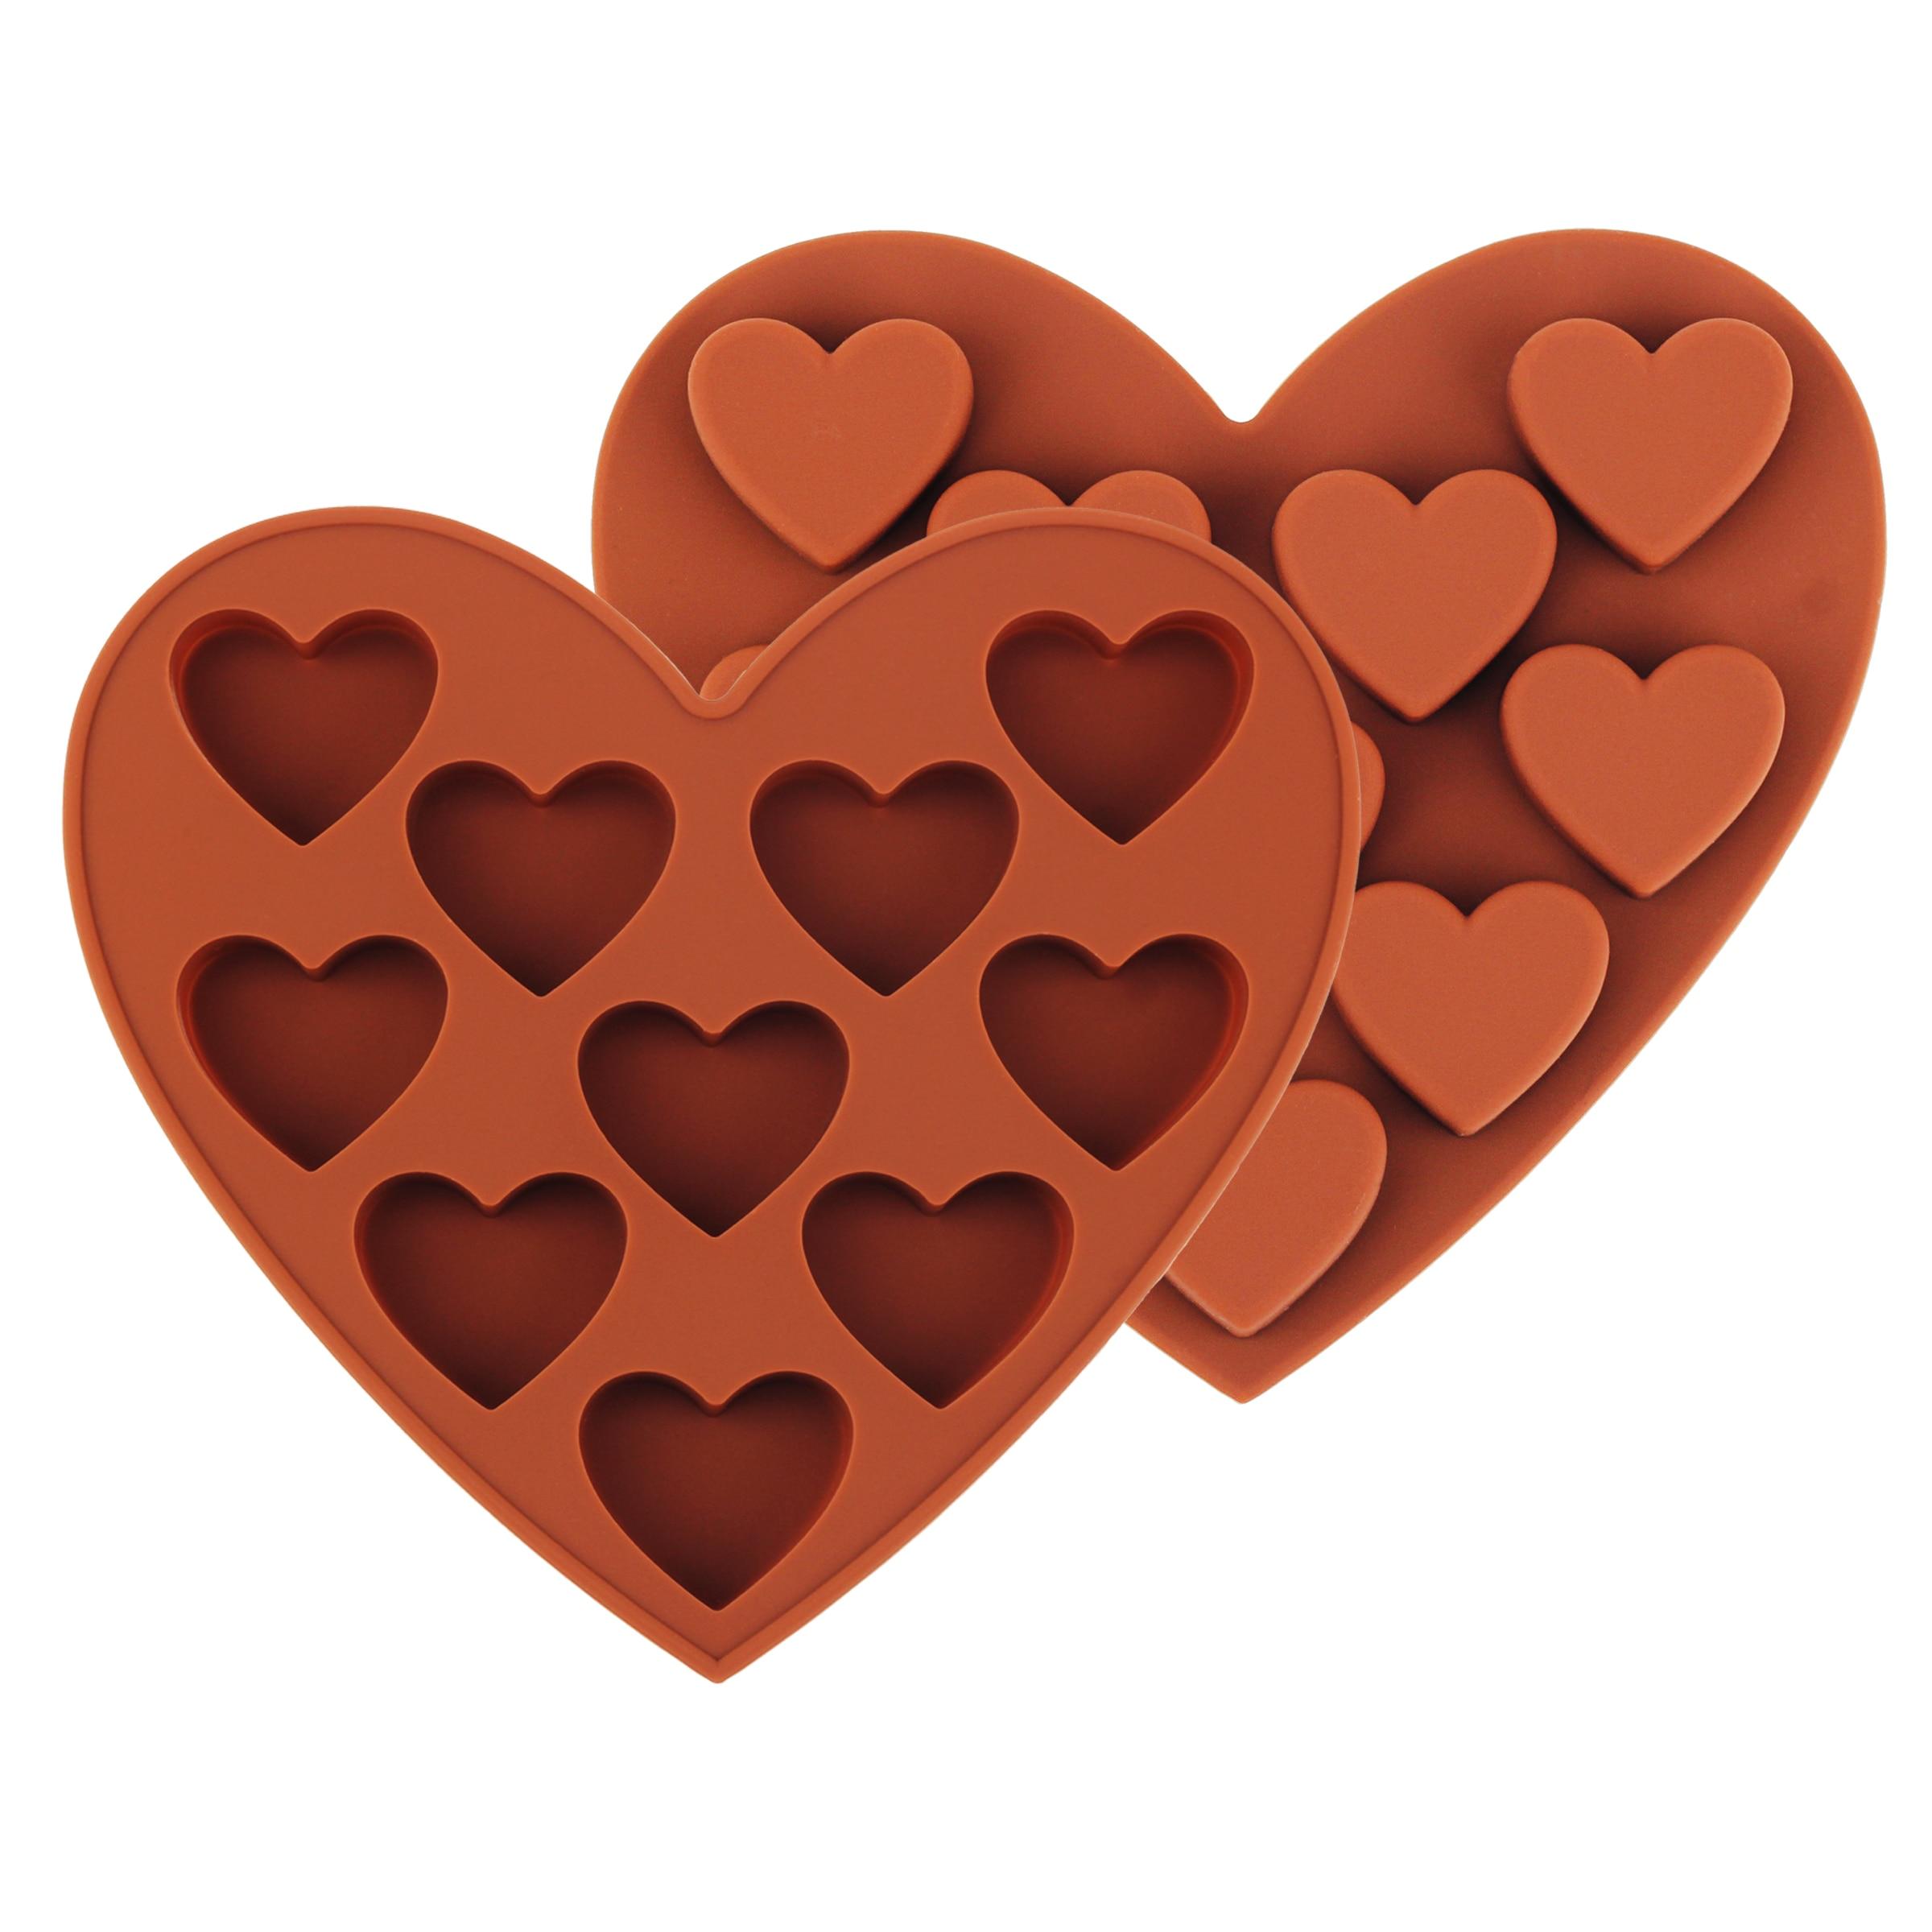 Silicone Mini Heart Shaped Chocolate Chunk Cake Baking Mold Tool DIY Mold Kitchen Tool недорого